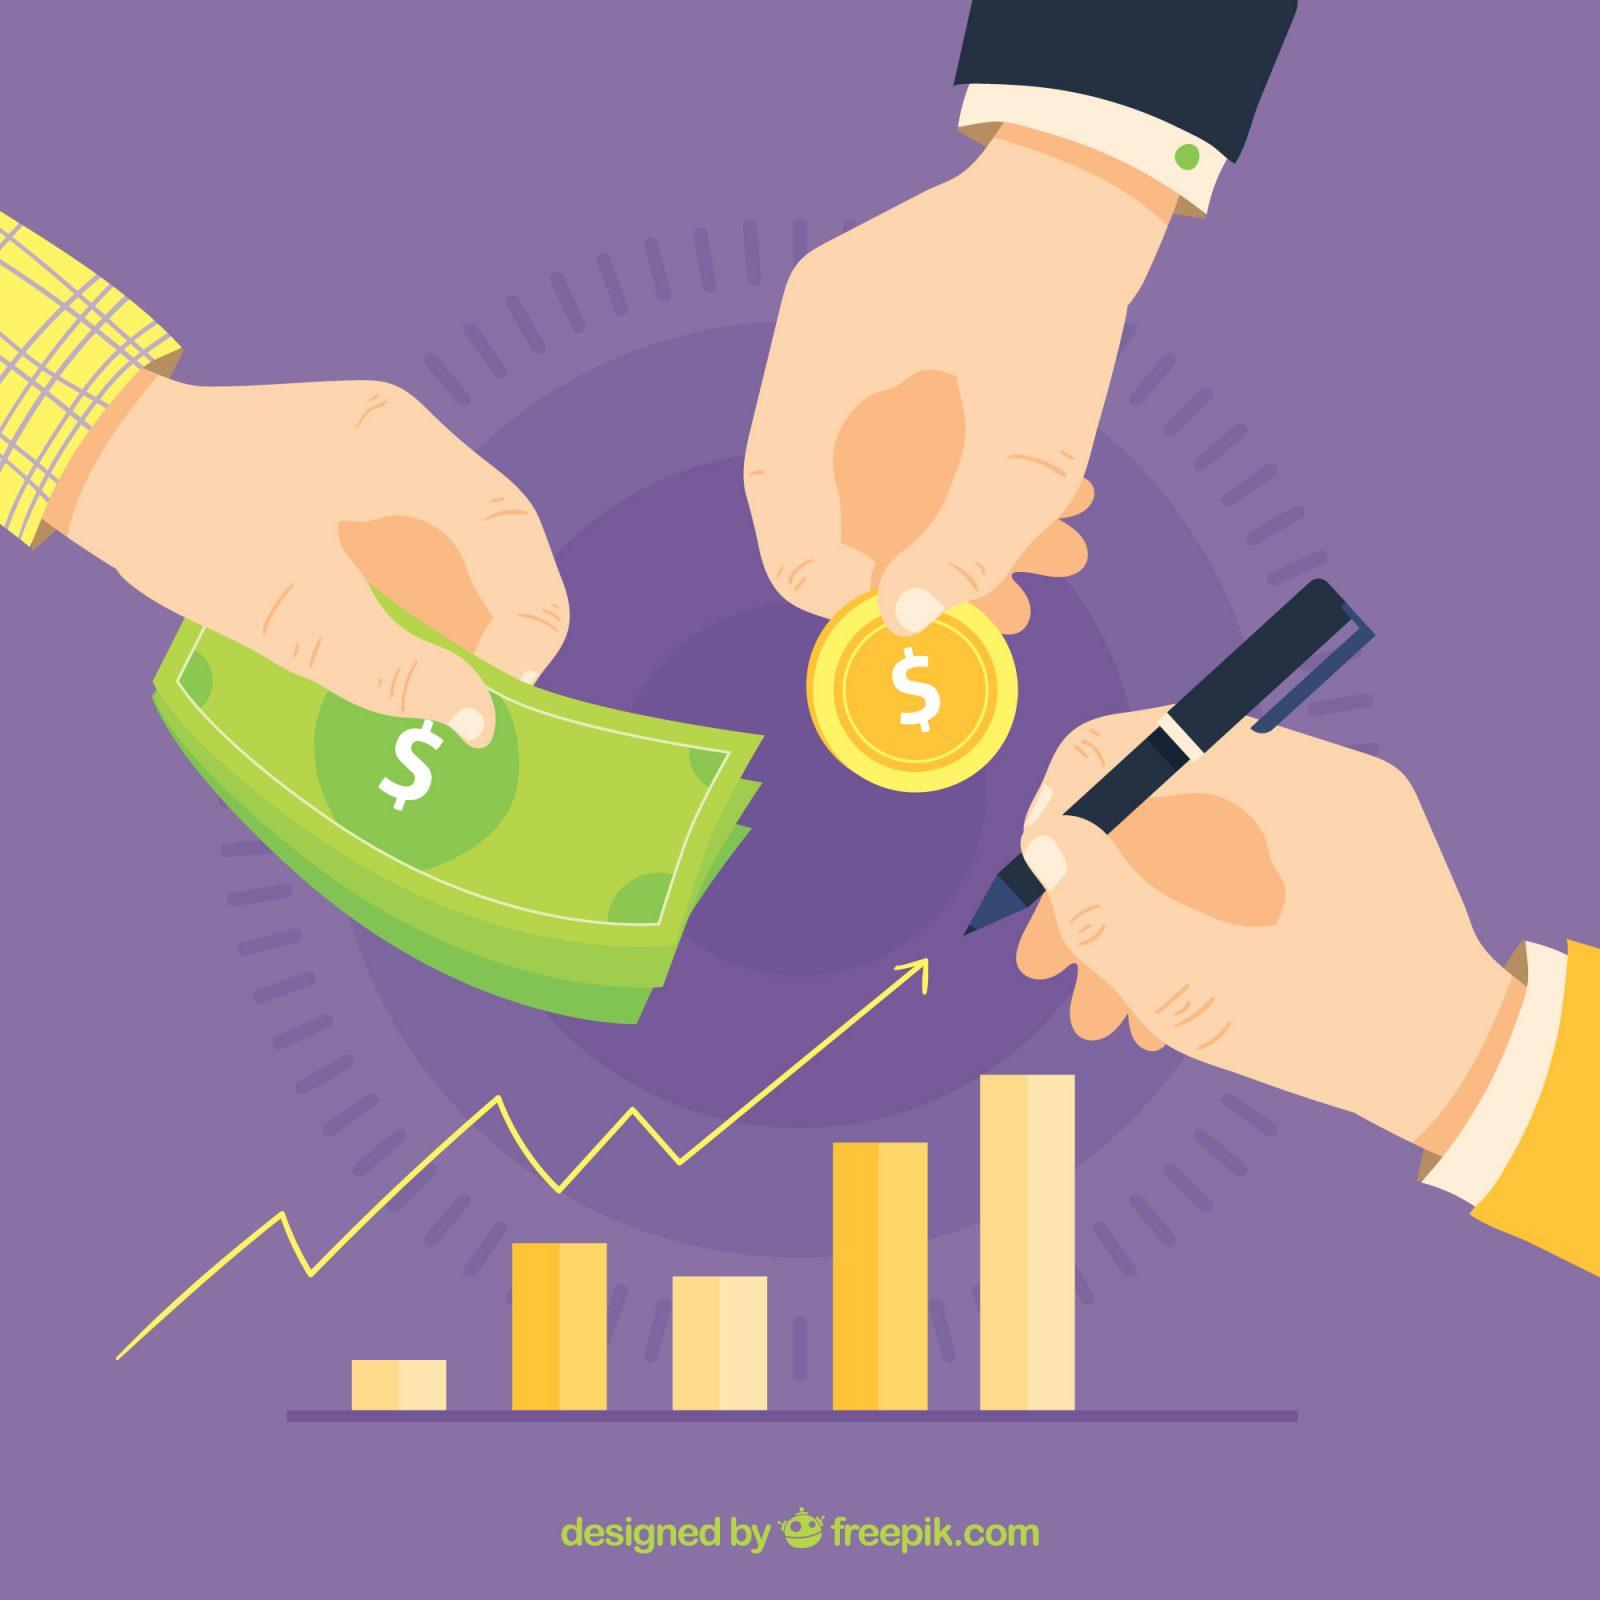 Debênture: o que é e como investir